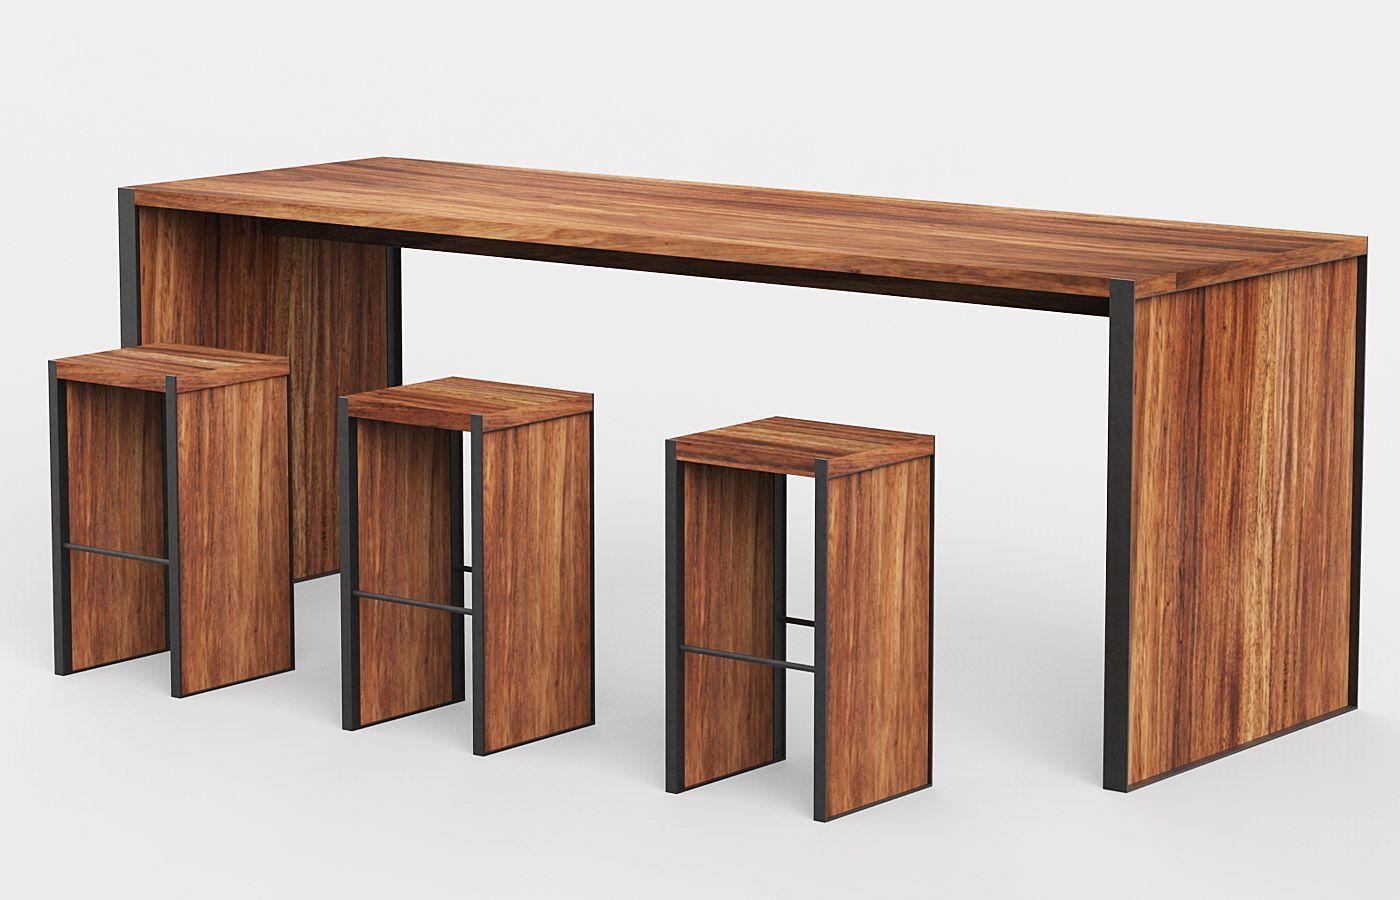 Parotas Designs A Range Of Modern Wooden Bar Tables As Well As Can Produce Custom Designed Wooden Bar Tables And S Bar Table Bar Table Design Wooden Bar Table